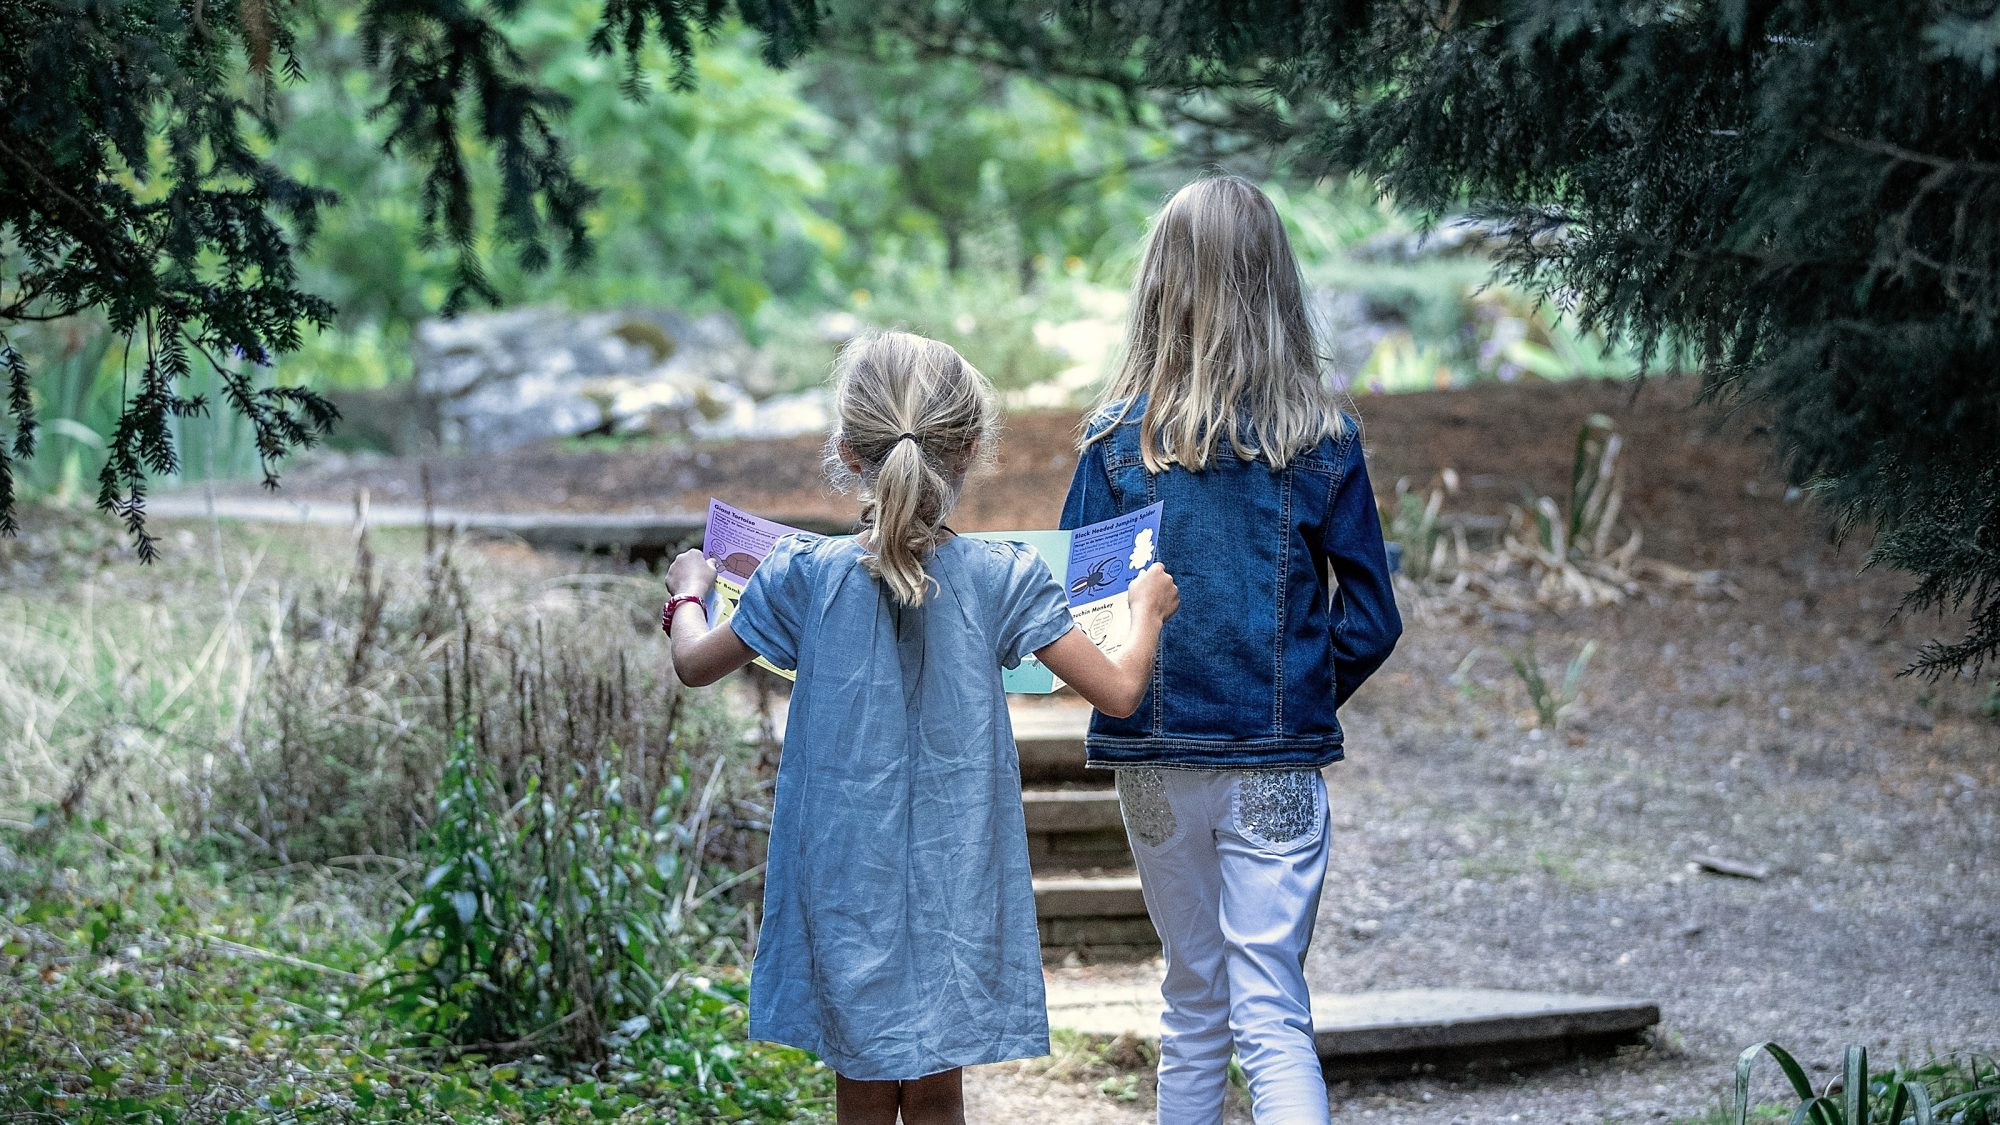 Children entering the rock garden, via Lynch Walk.